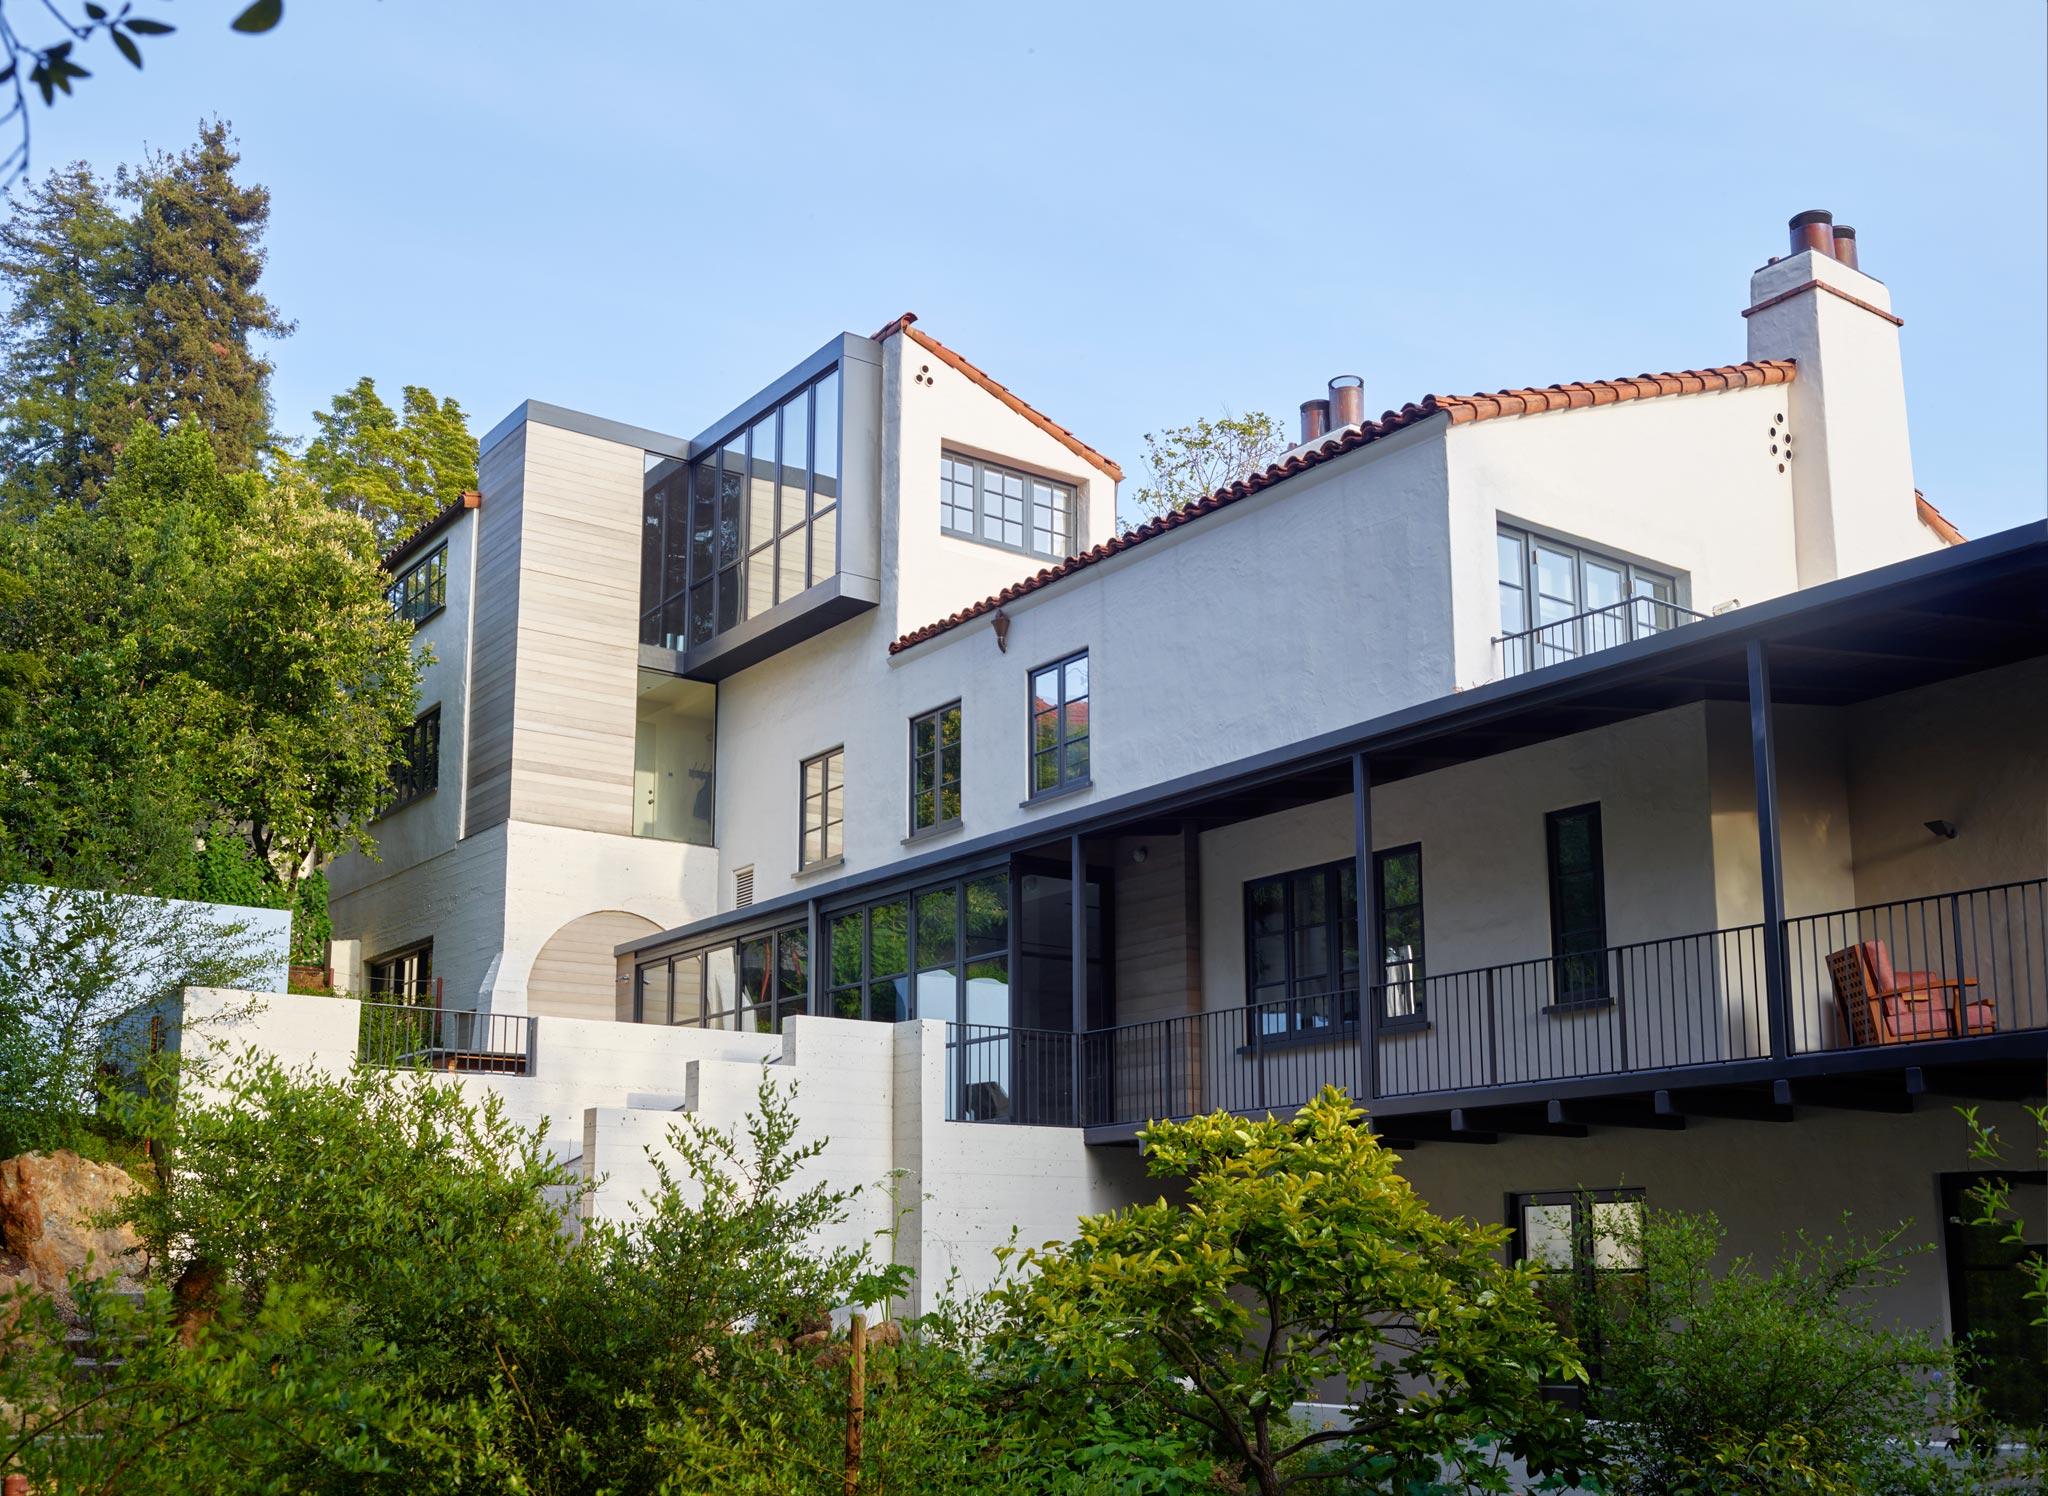 McDuffie Estate in Berkeley exterior view of house